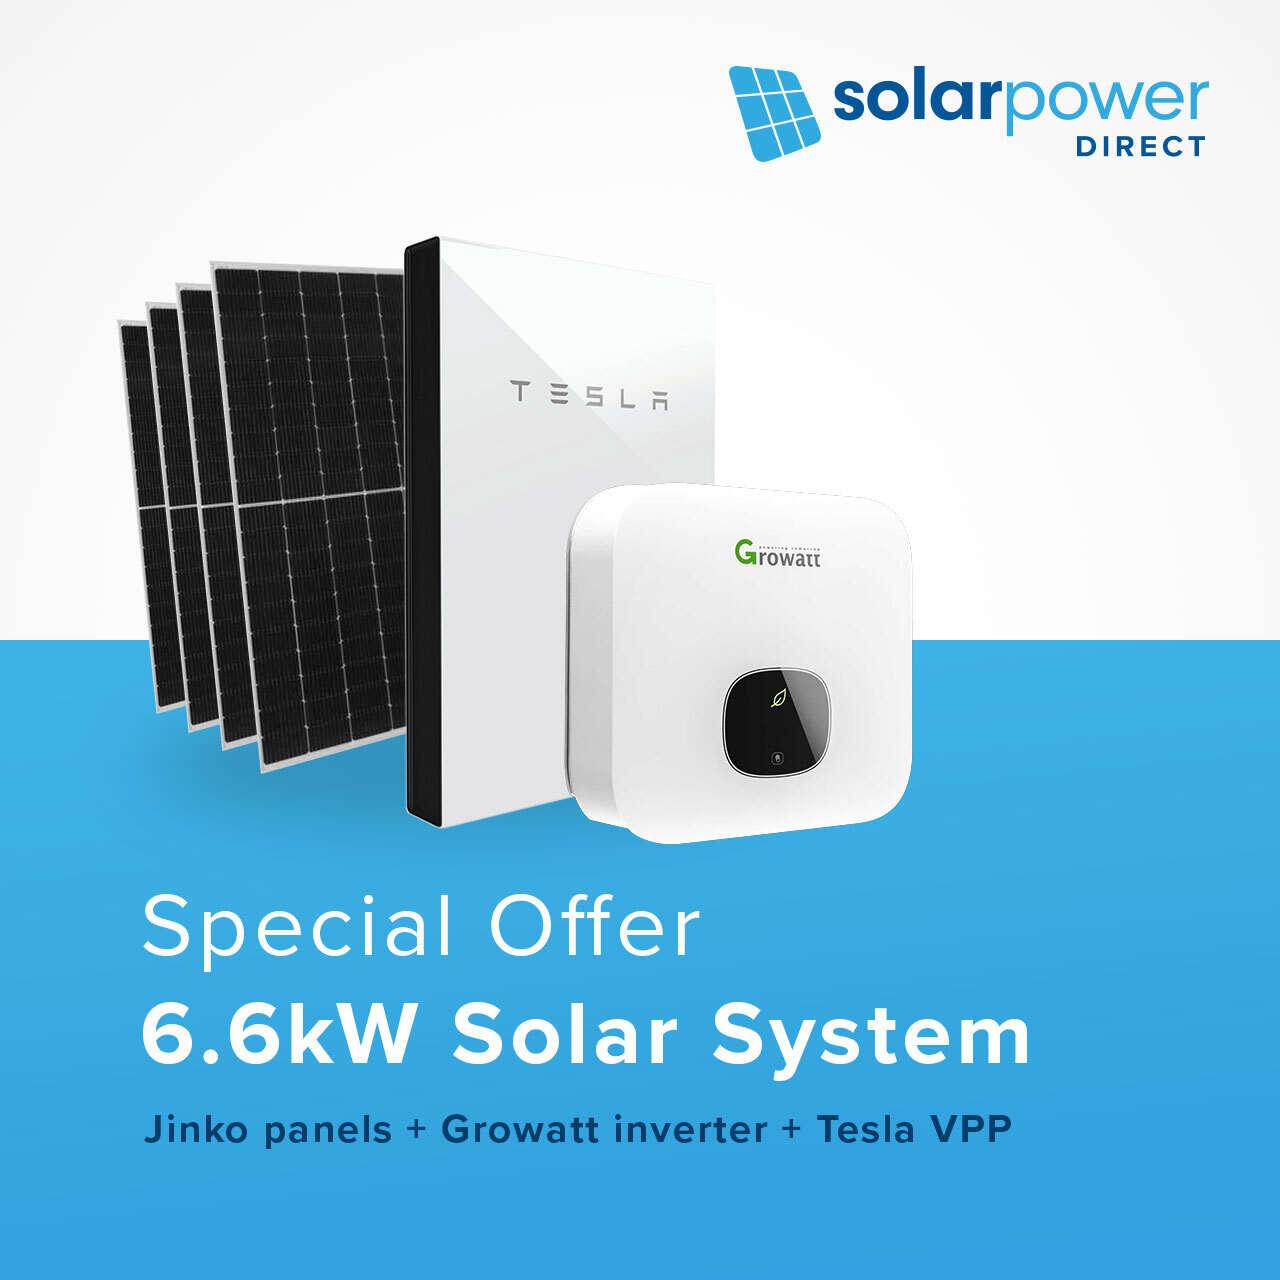 8.8kW Solar System + Tesla VPP for $15,599